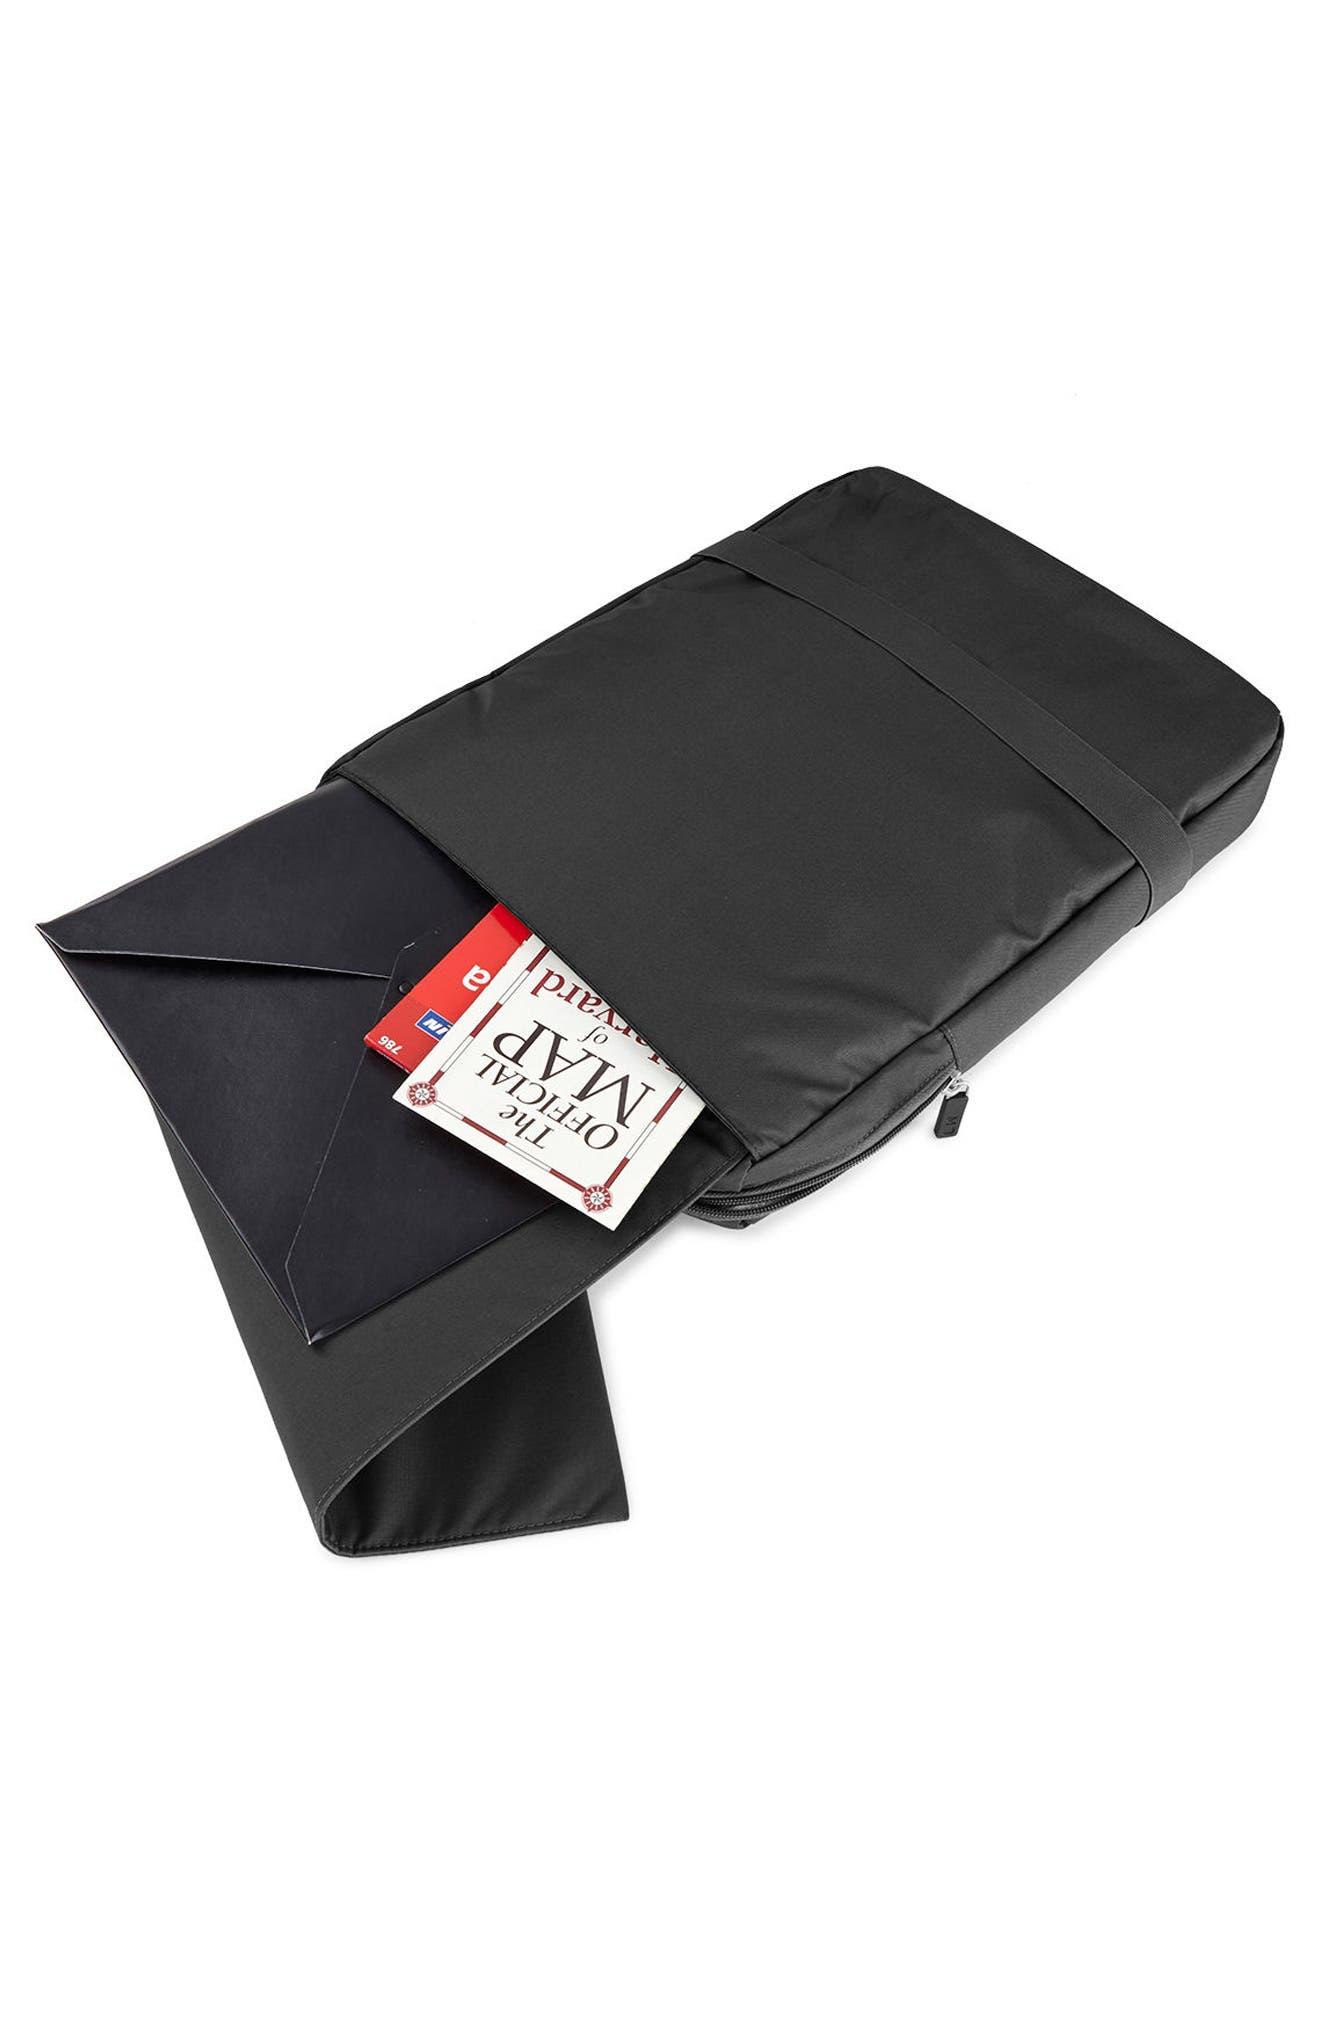 Vertical Device Bag,                             Alternate thumbnail 3, color,                             001